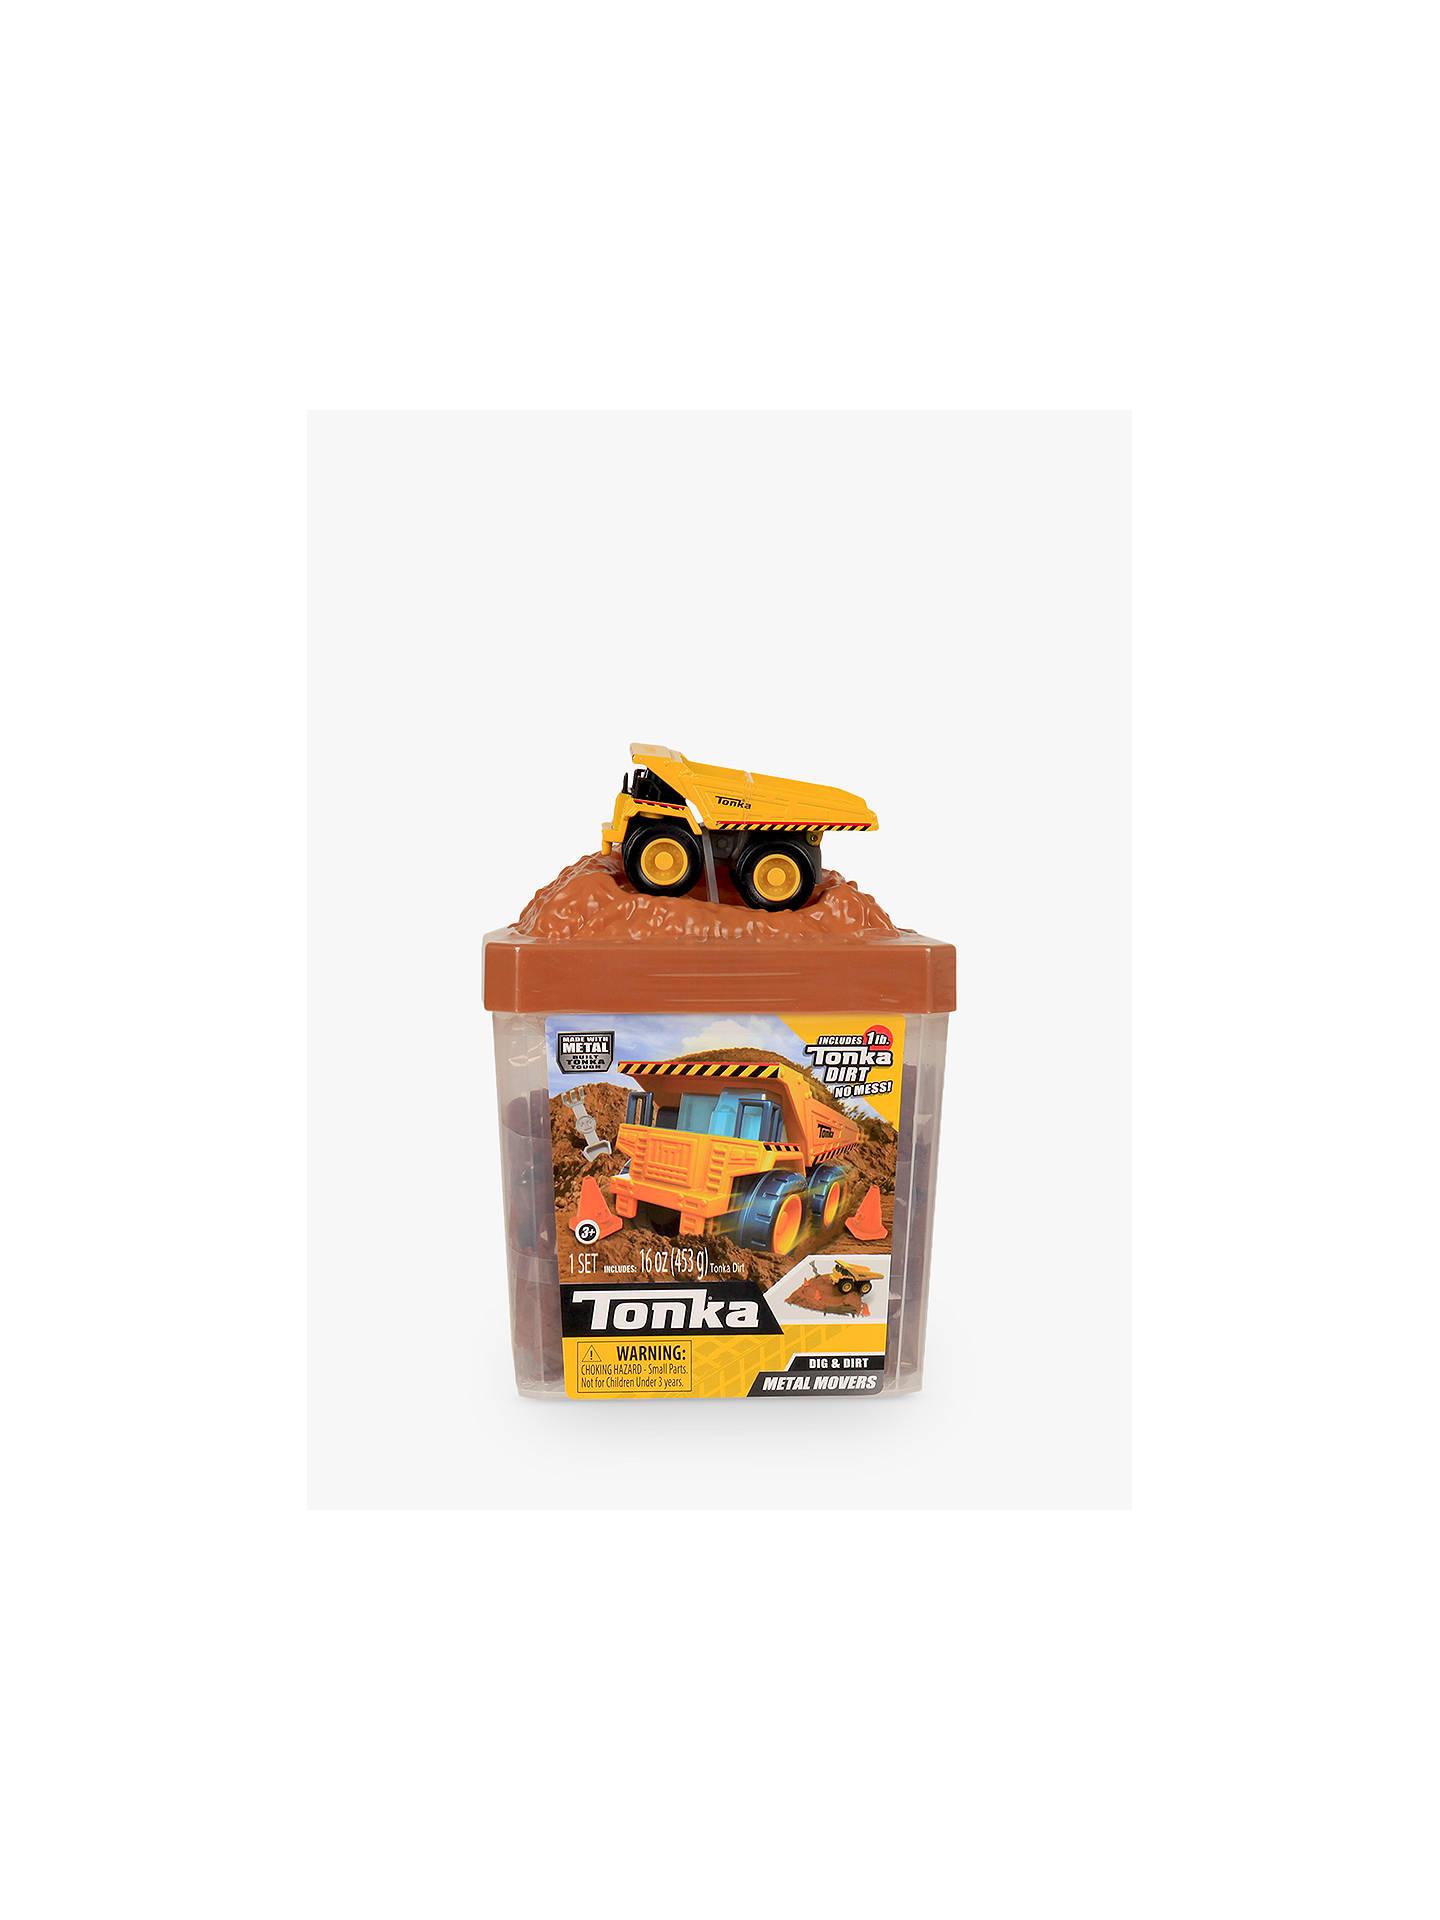 Tonka Toy Trucks >> Tonka Dump Truck